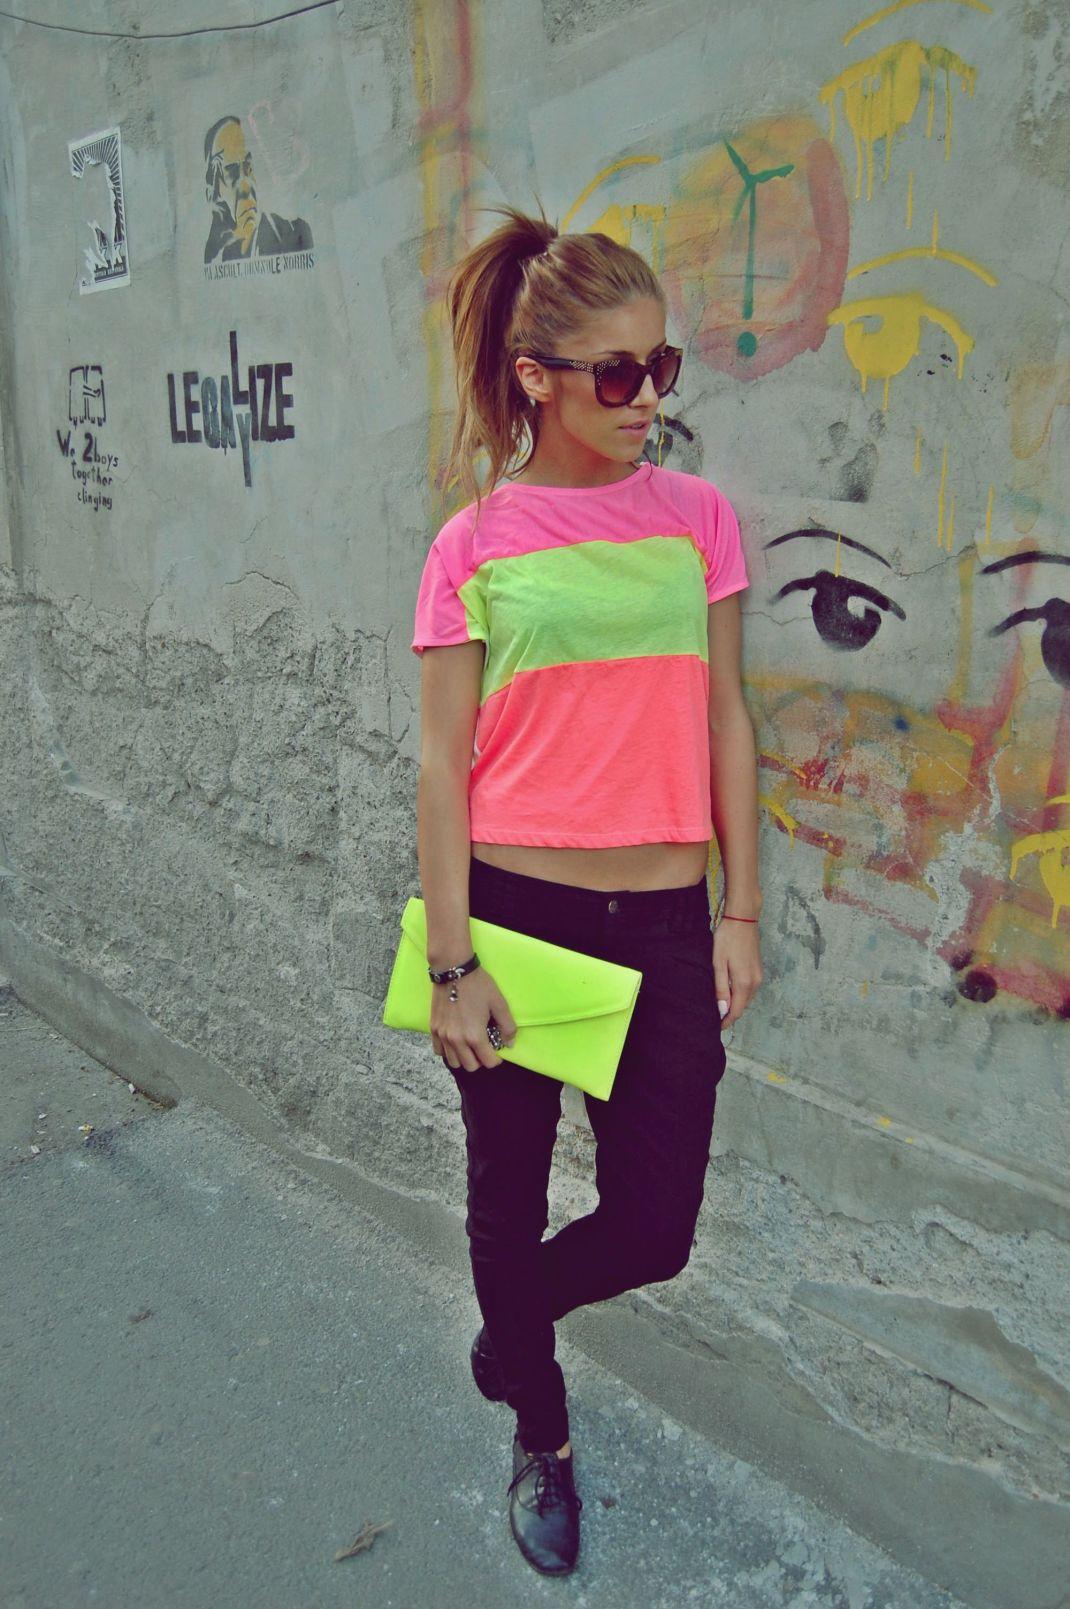 Legalize the colors – bday